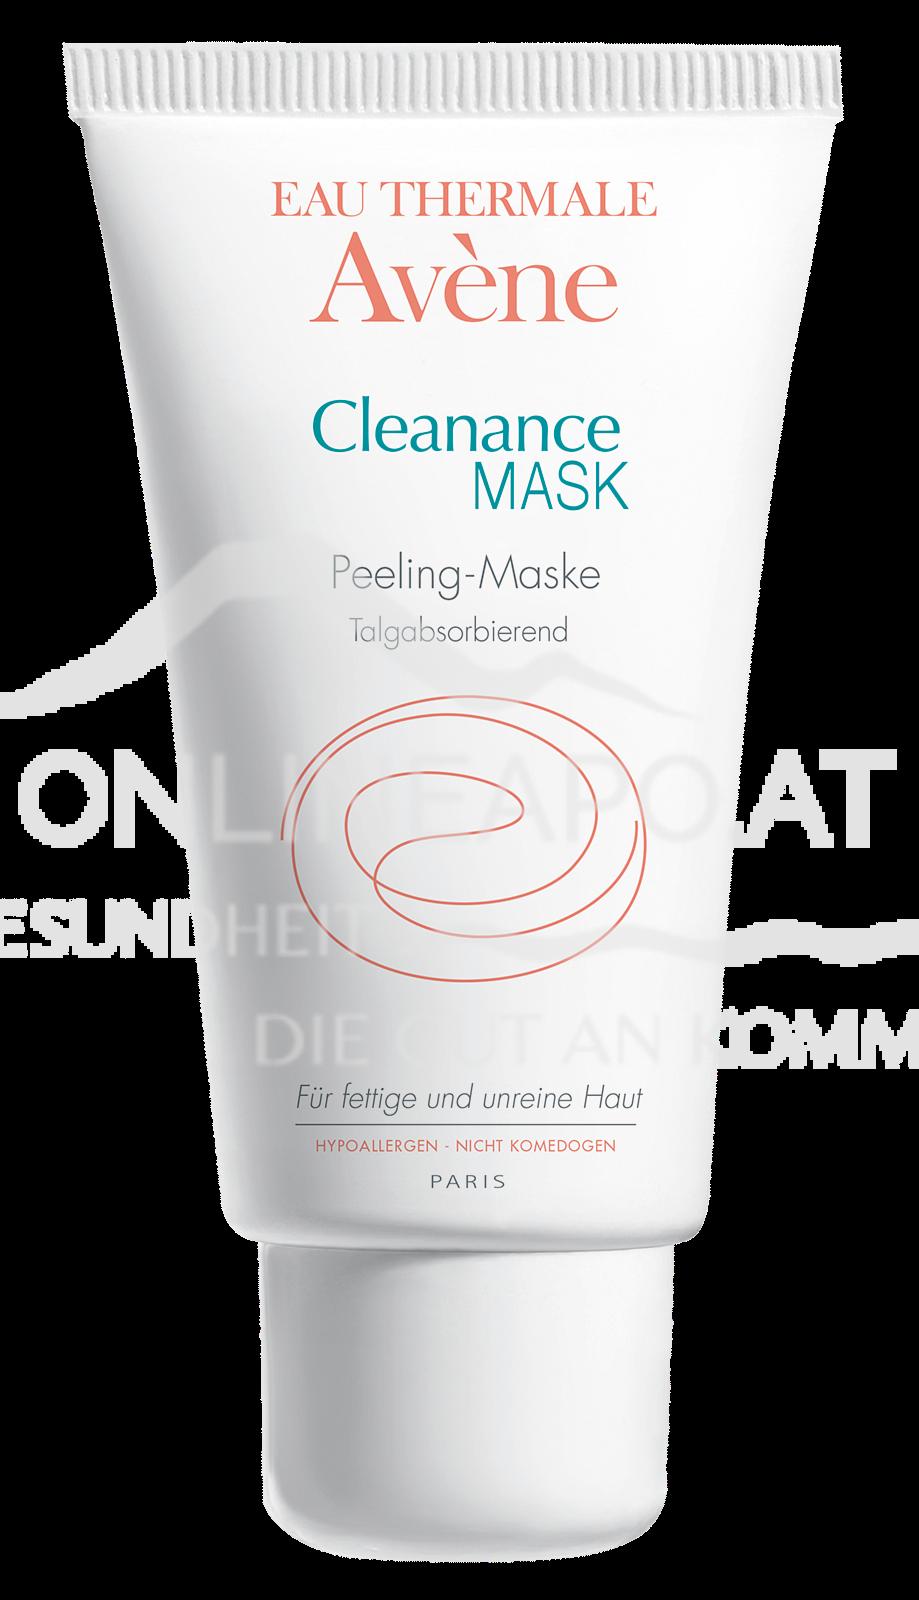 Avène Cleanance Mask Peeling-Maske